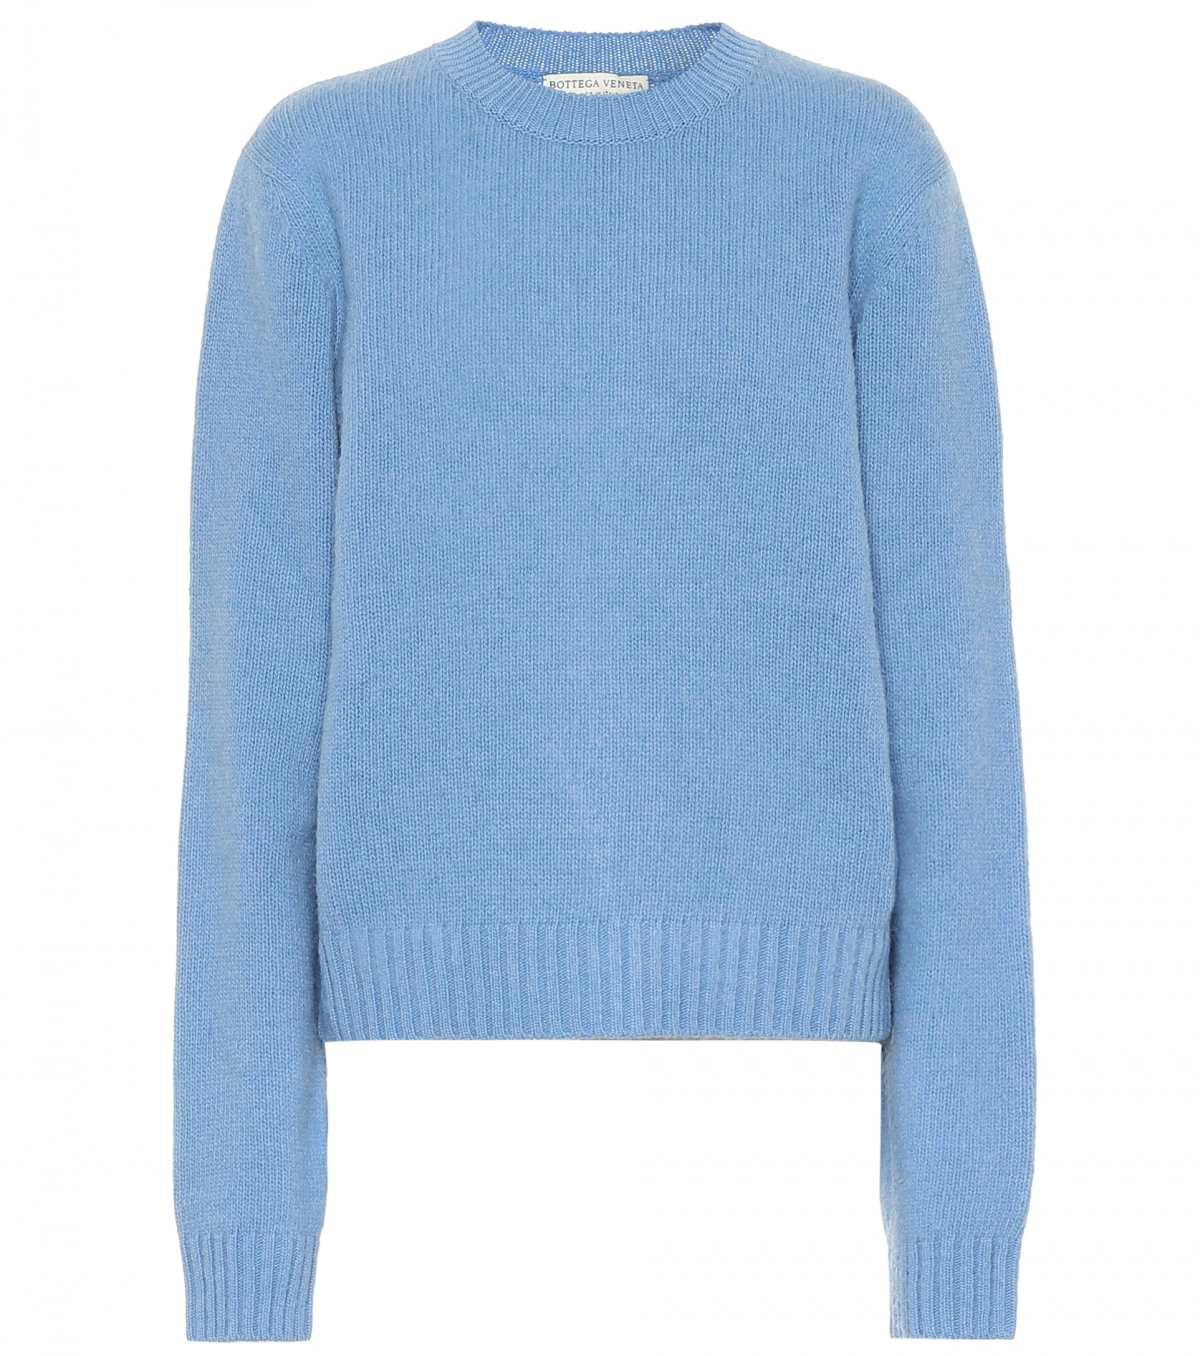 Kendall Jenner donning a Pale blue Bottega Veneta woolen sweater with a woolen material and a mandarin neck